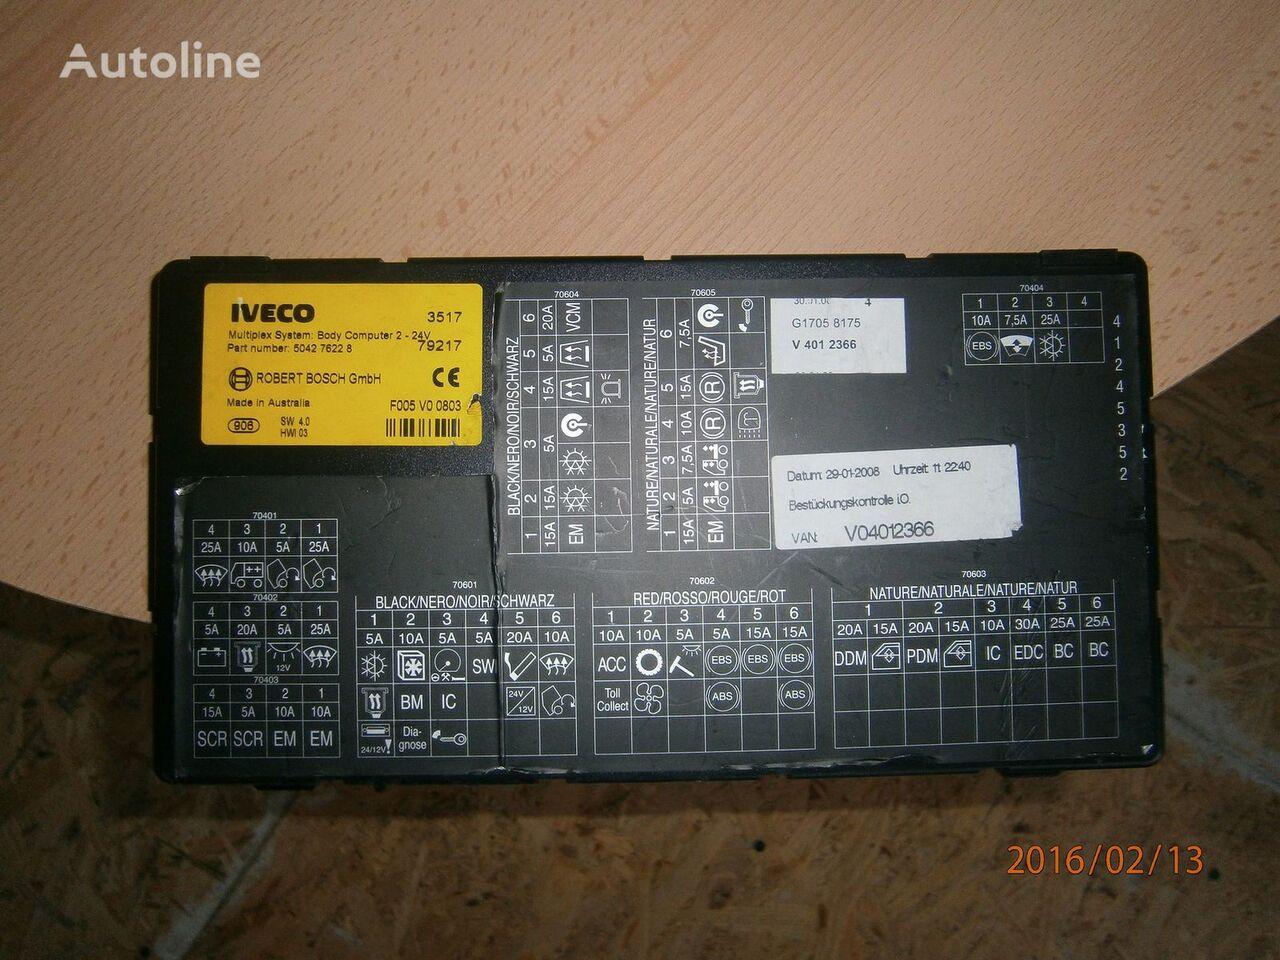 IVECO Stralis tır için Iveco Stralis EURO5 Multiplex system body computer 504276228 yönetim bloğu